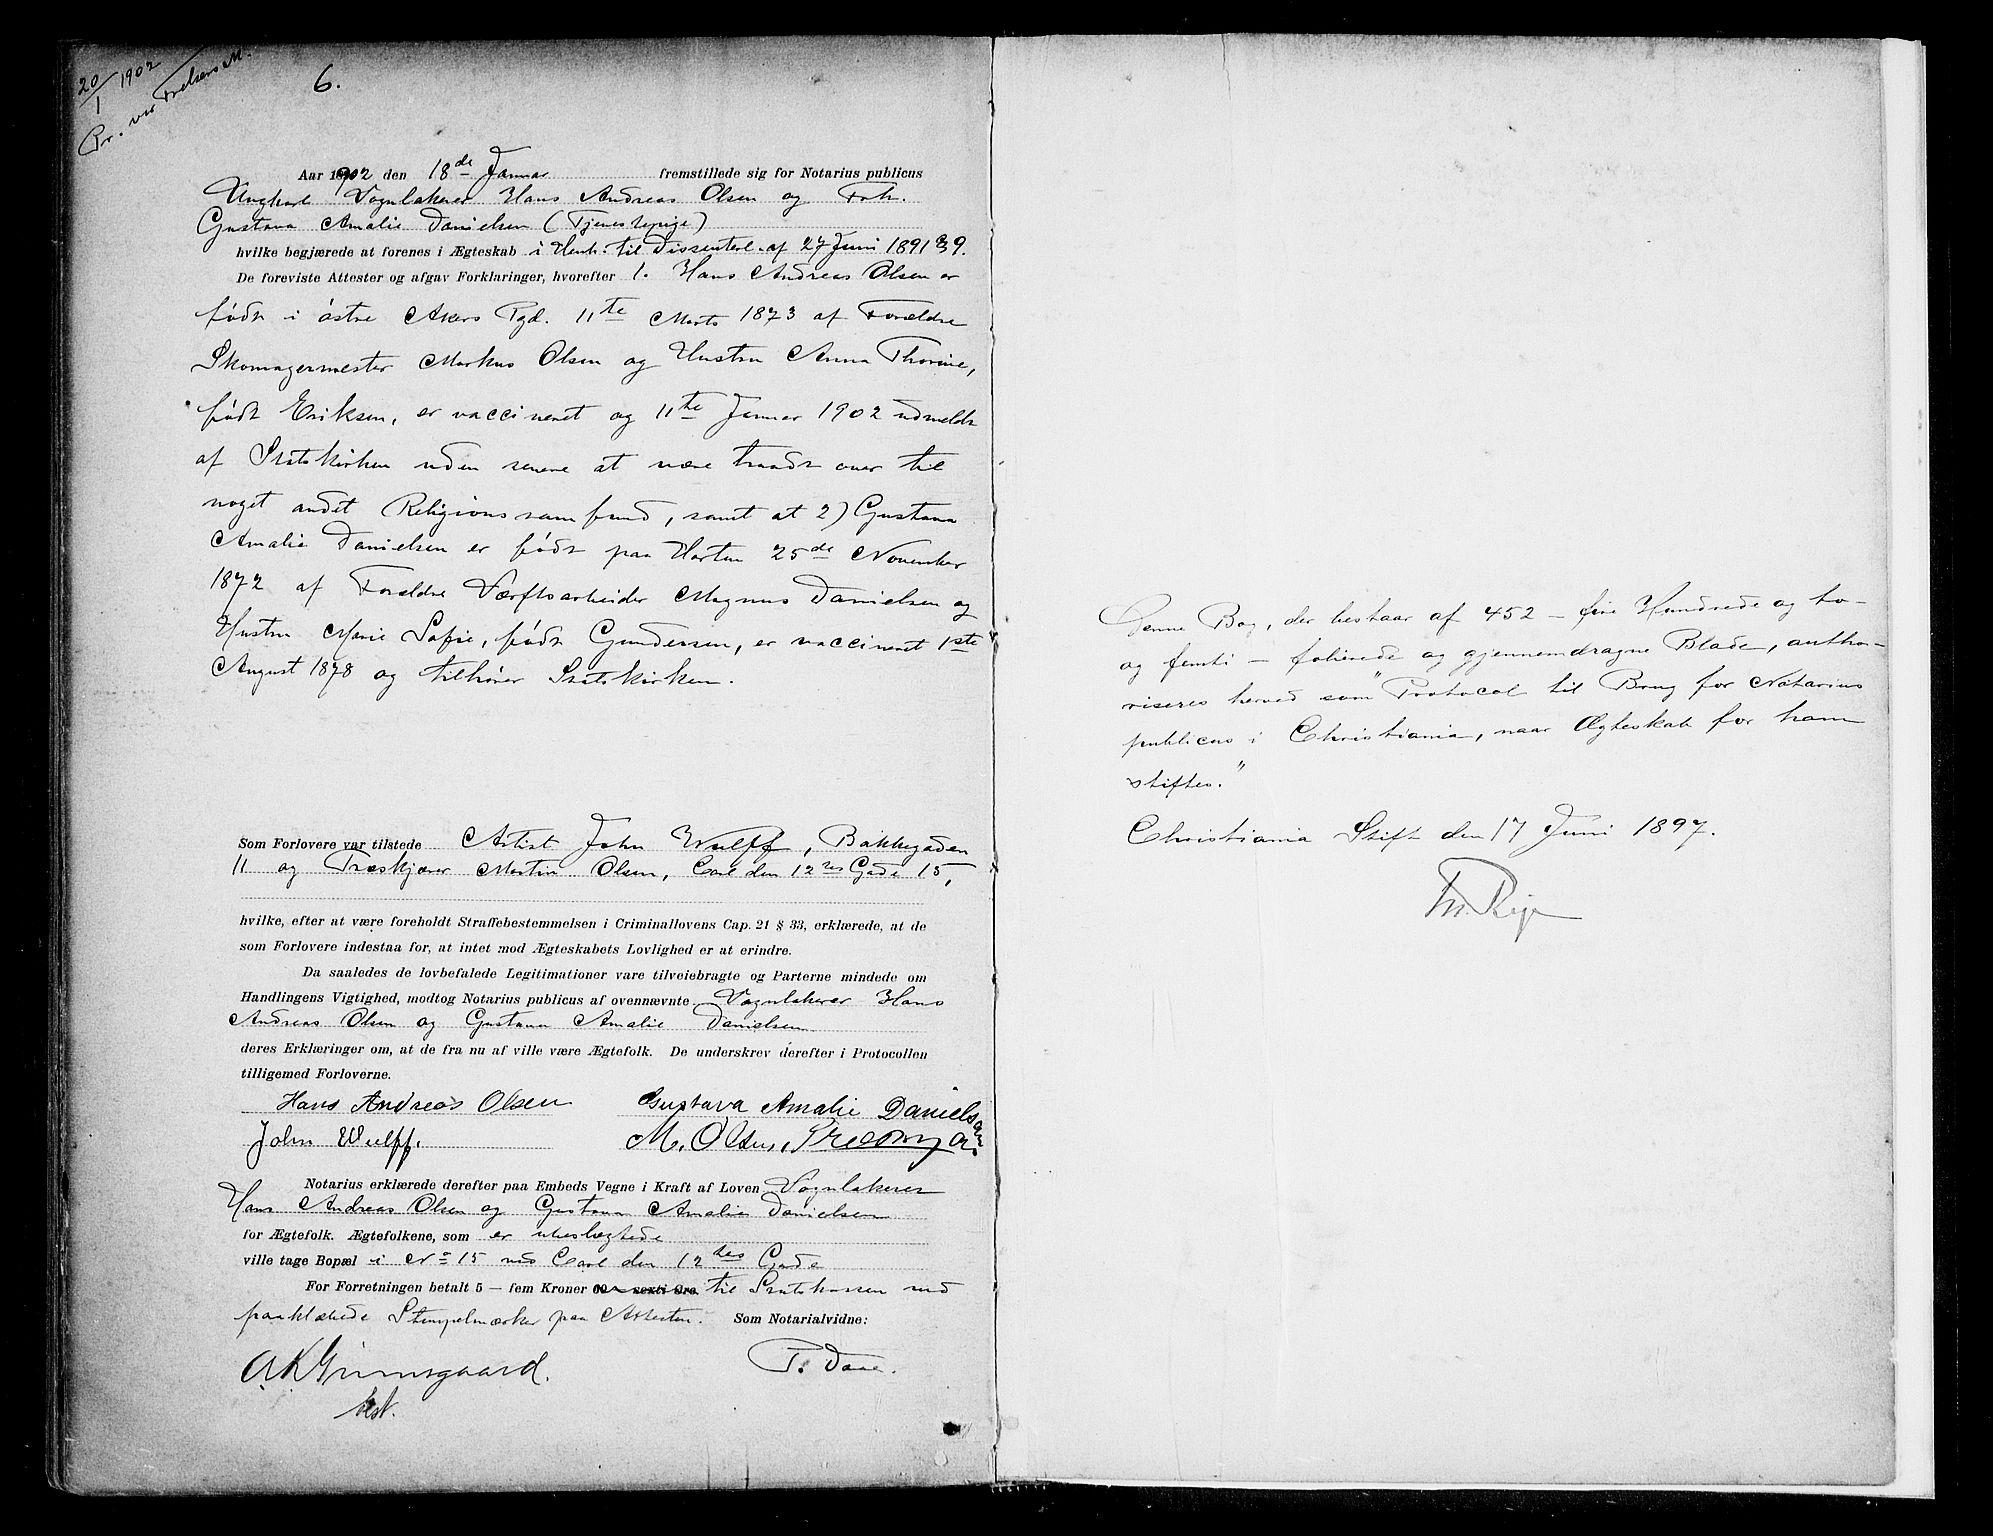 SAO, Oslo byfogd avd. I, L/Lb/Lbb/L0005: Notarialprotokoll, rekke II: Vigsler, 1897-1902, s. 452b-453a